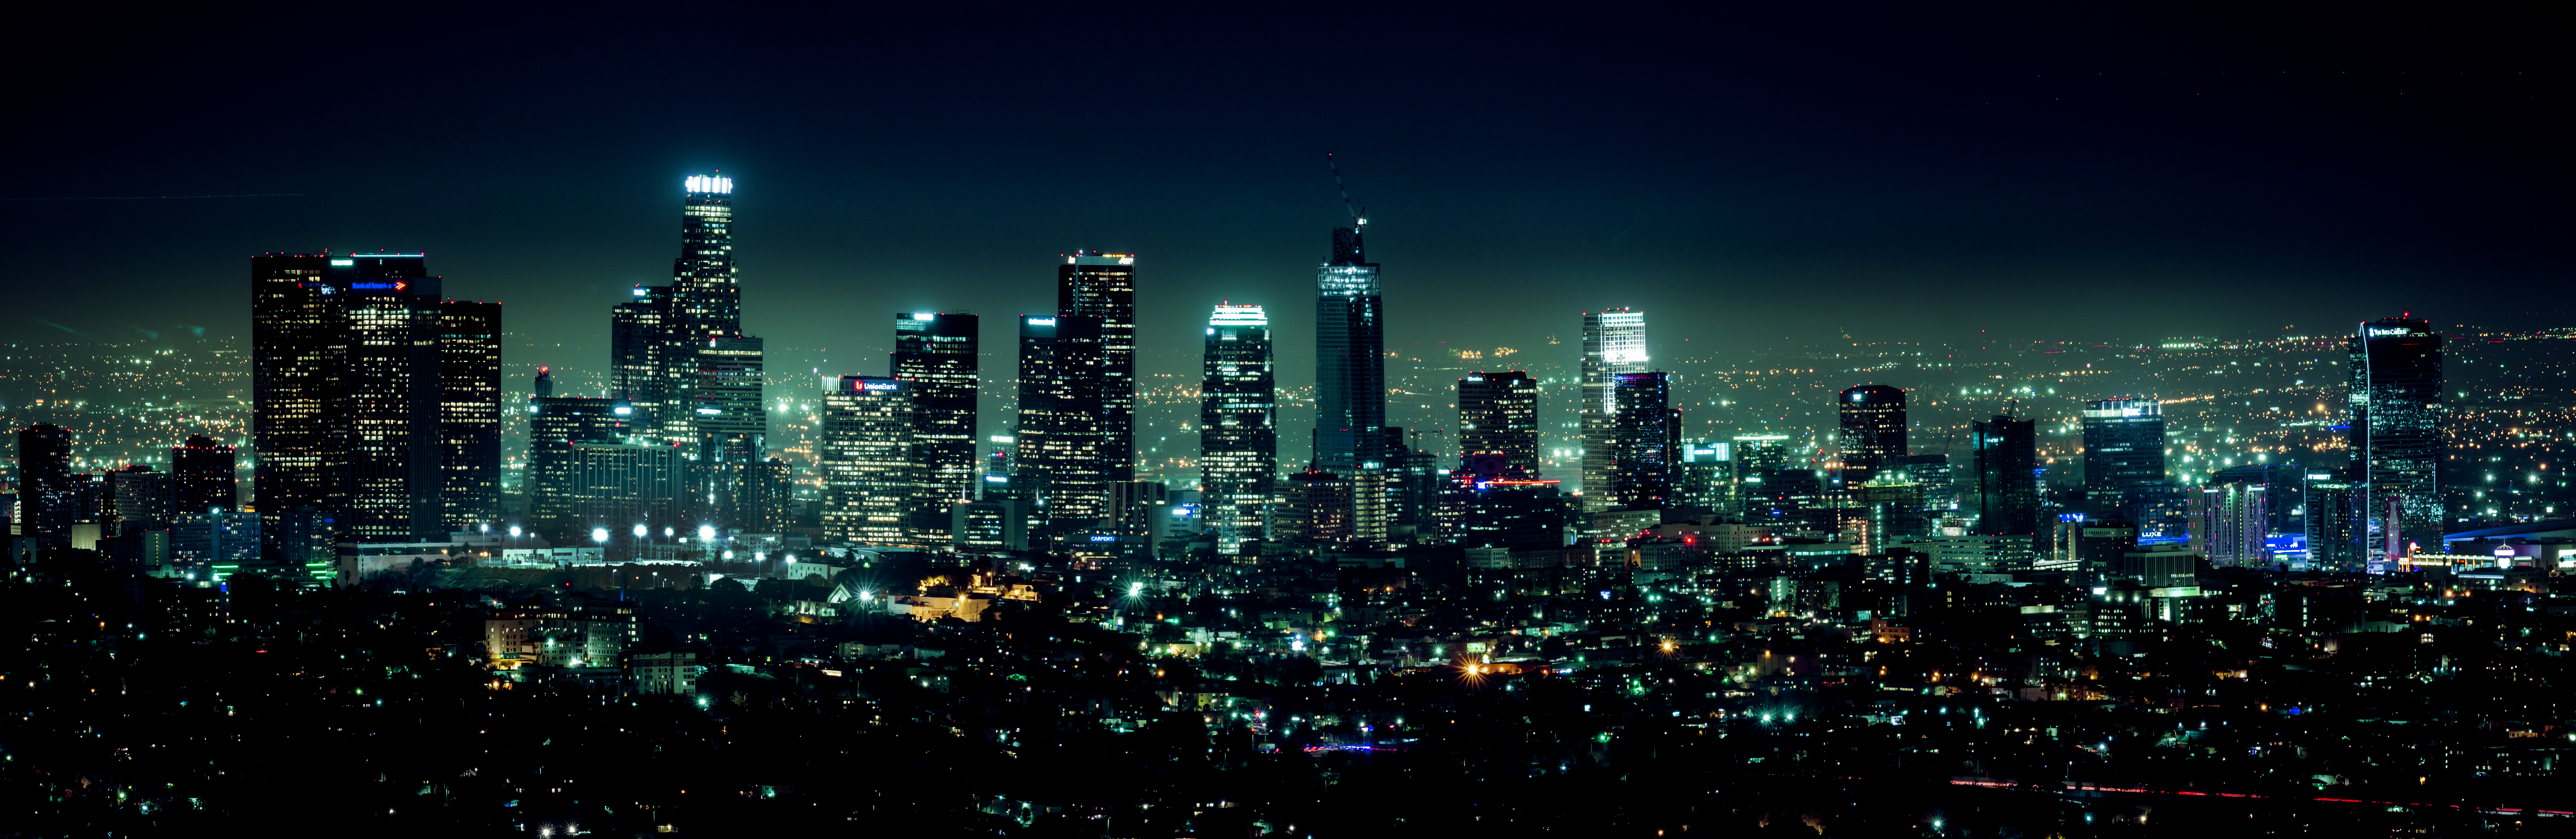 city-burned